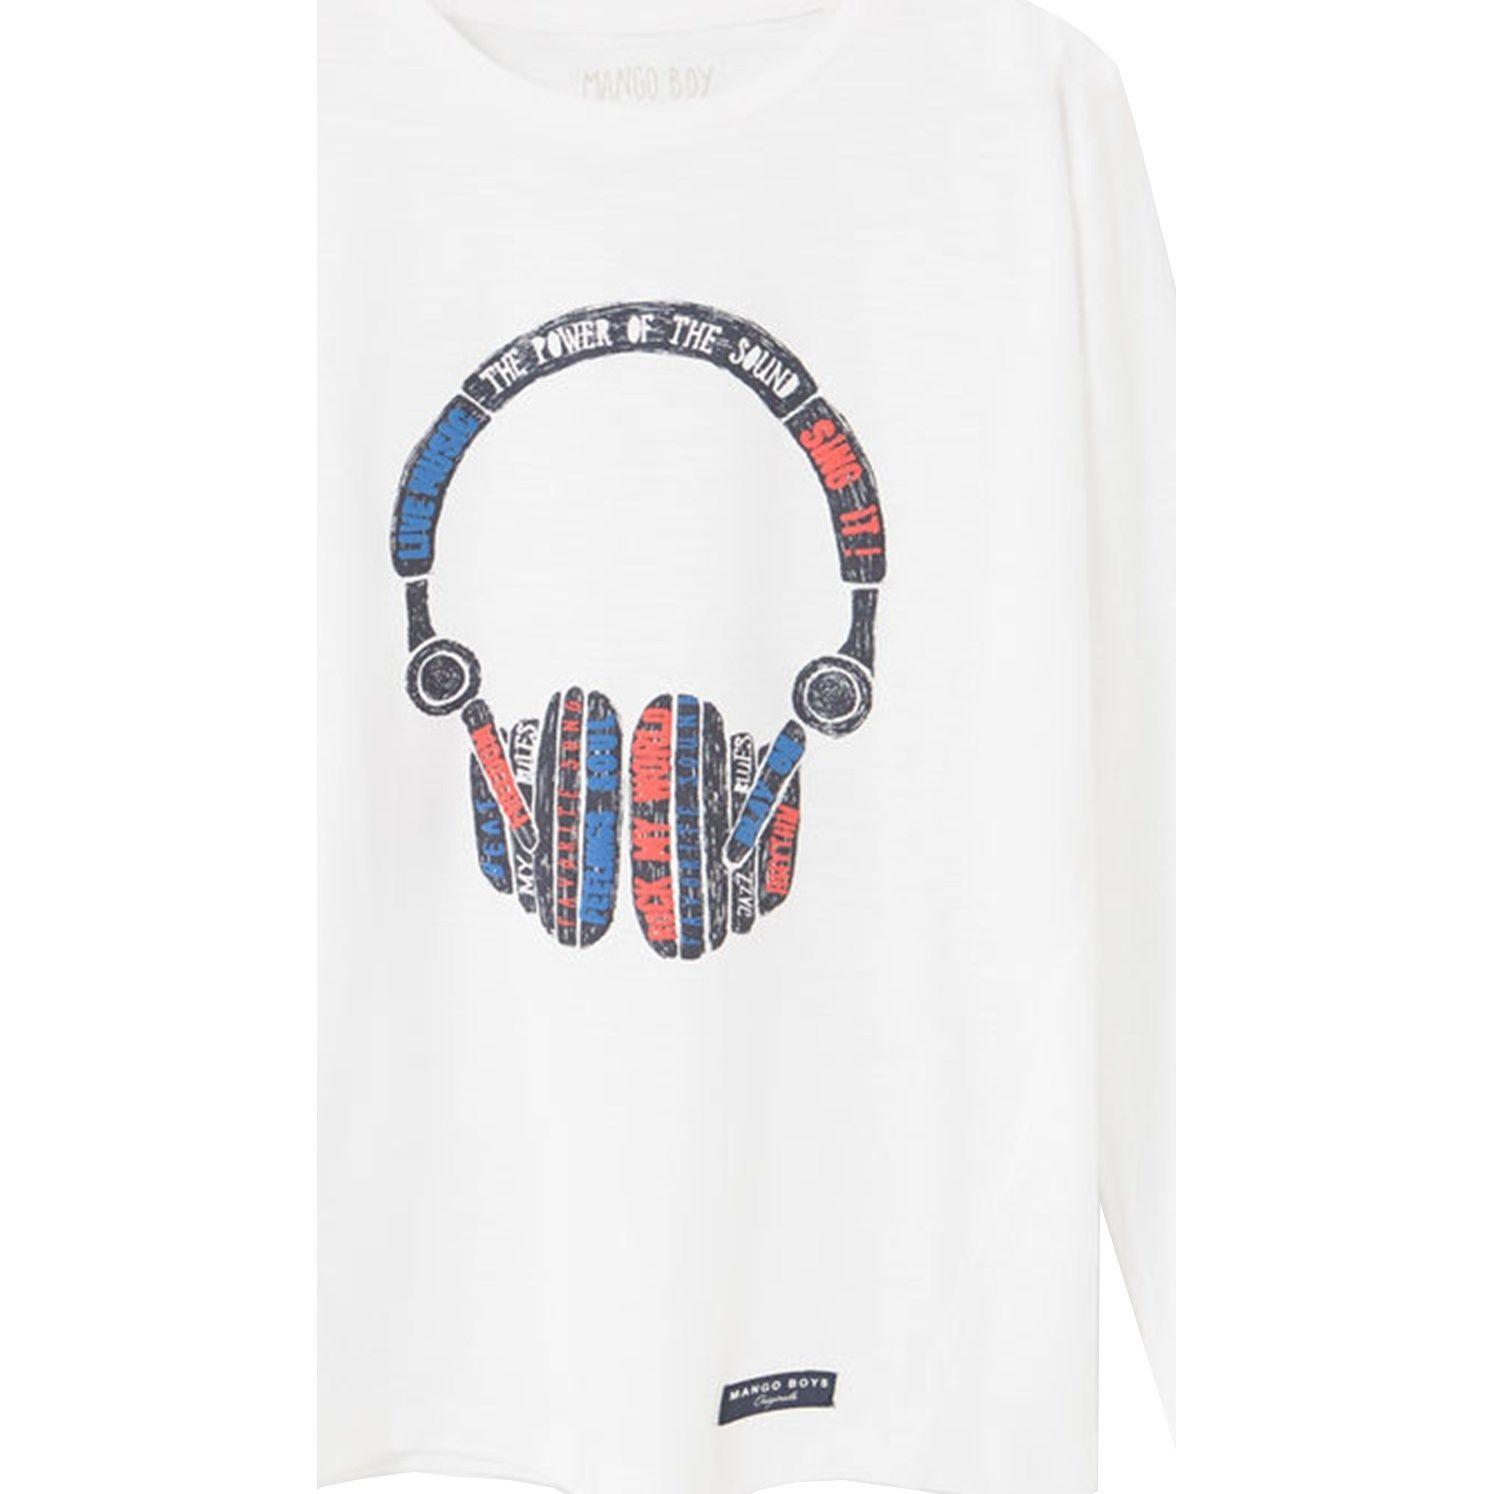 تی شرت نخی پسرانه - مانگو - سفيد - 1